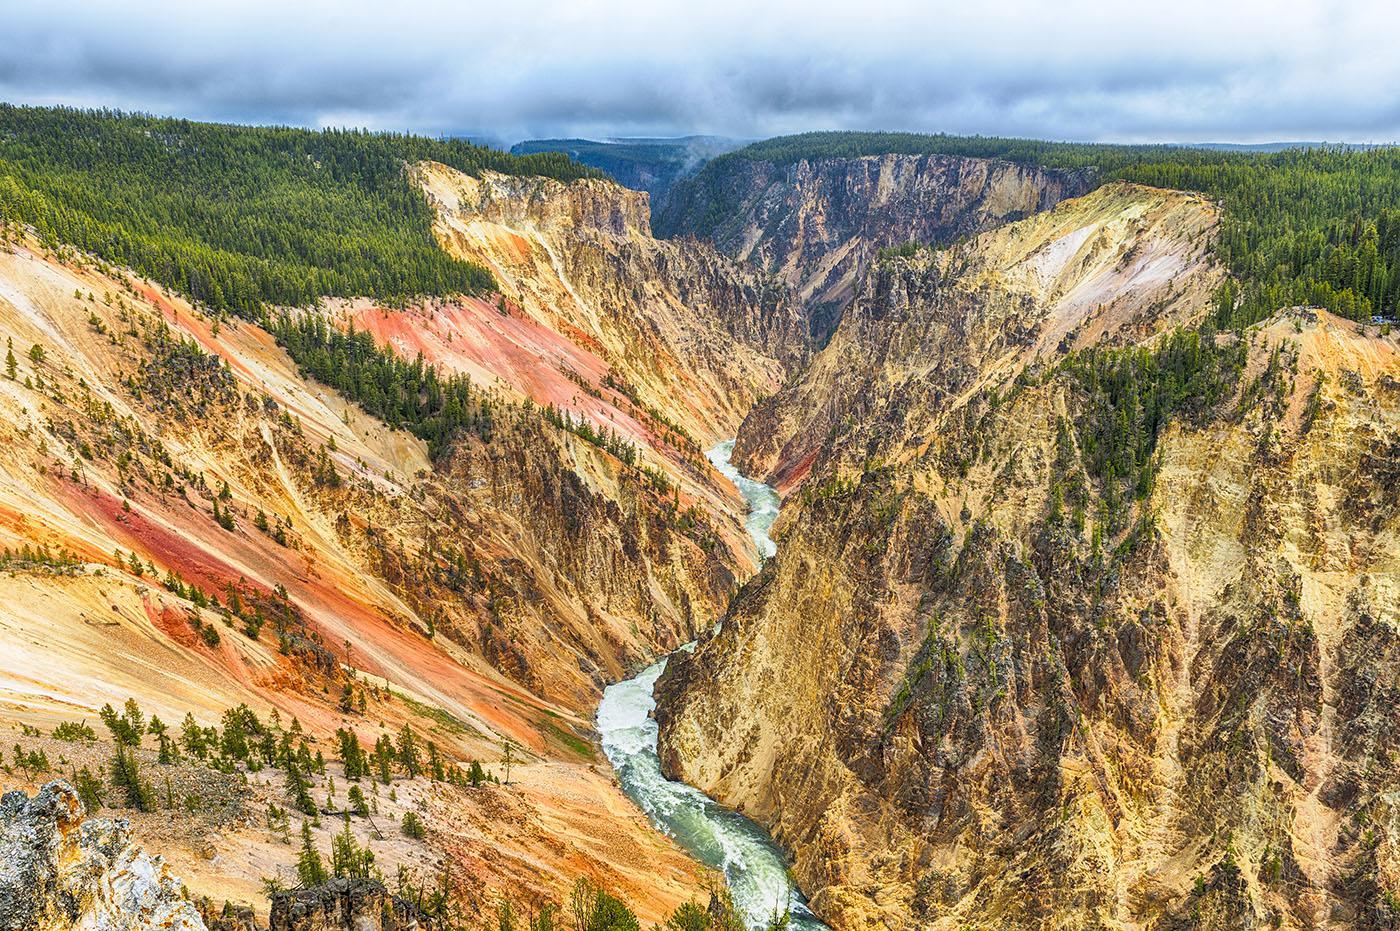 The Yellowstone River. Photo: Filip Fuxa/ Shutterstock.com